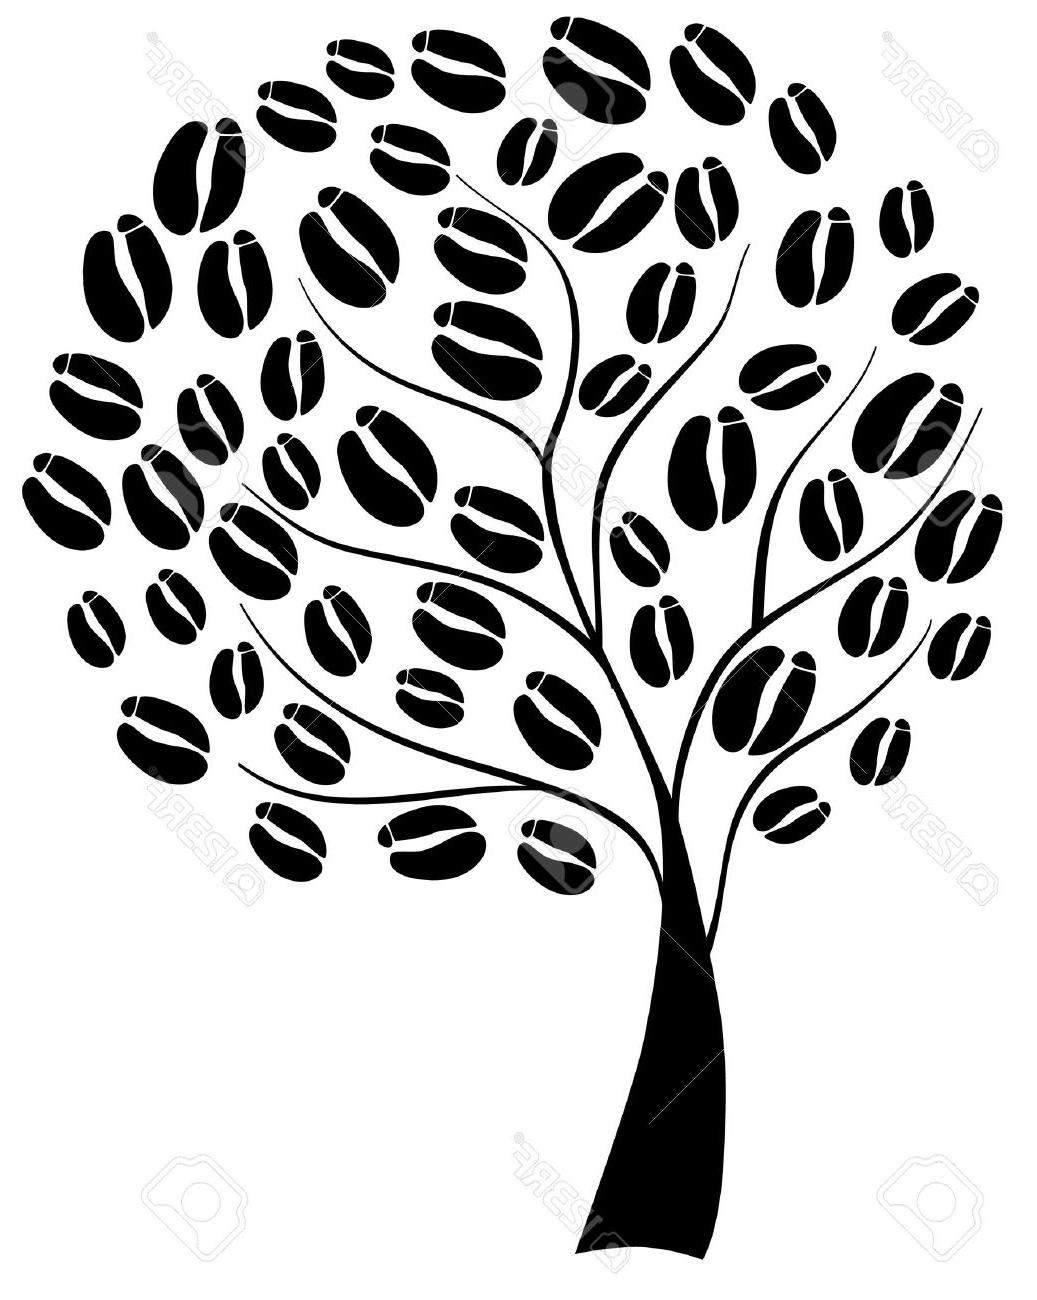 Unique Coffee Bean Tree Vector Drawing » Free Vector Art.